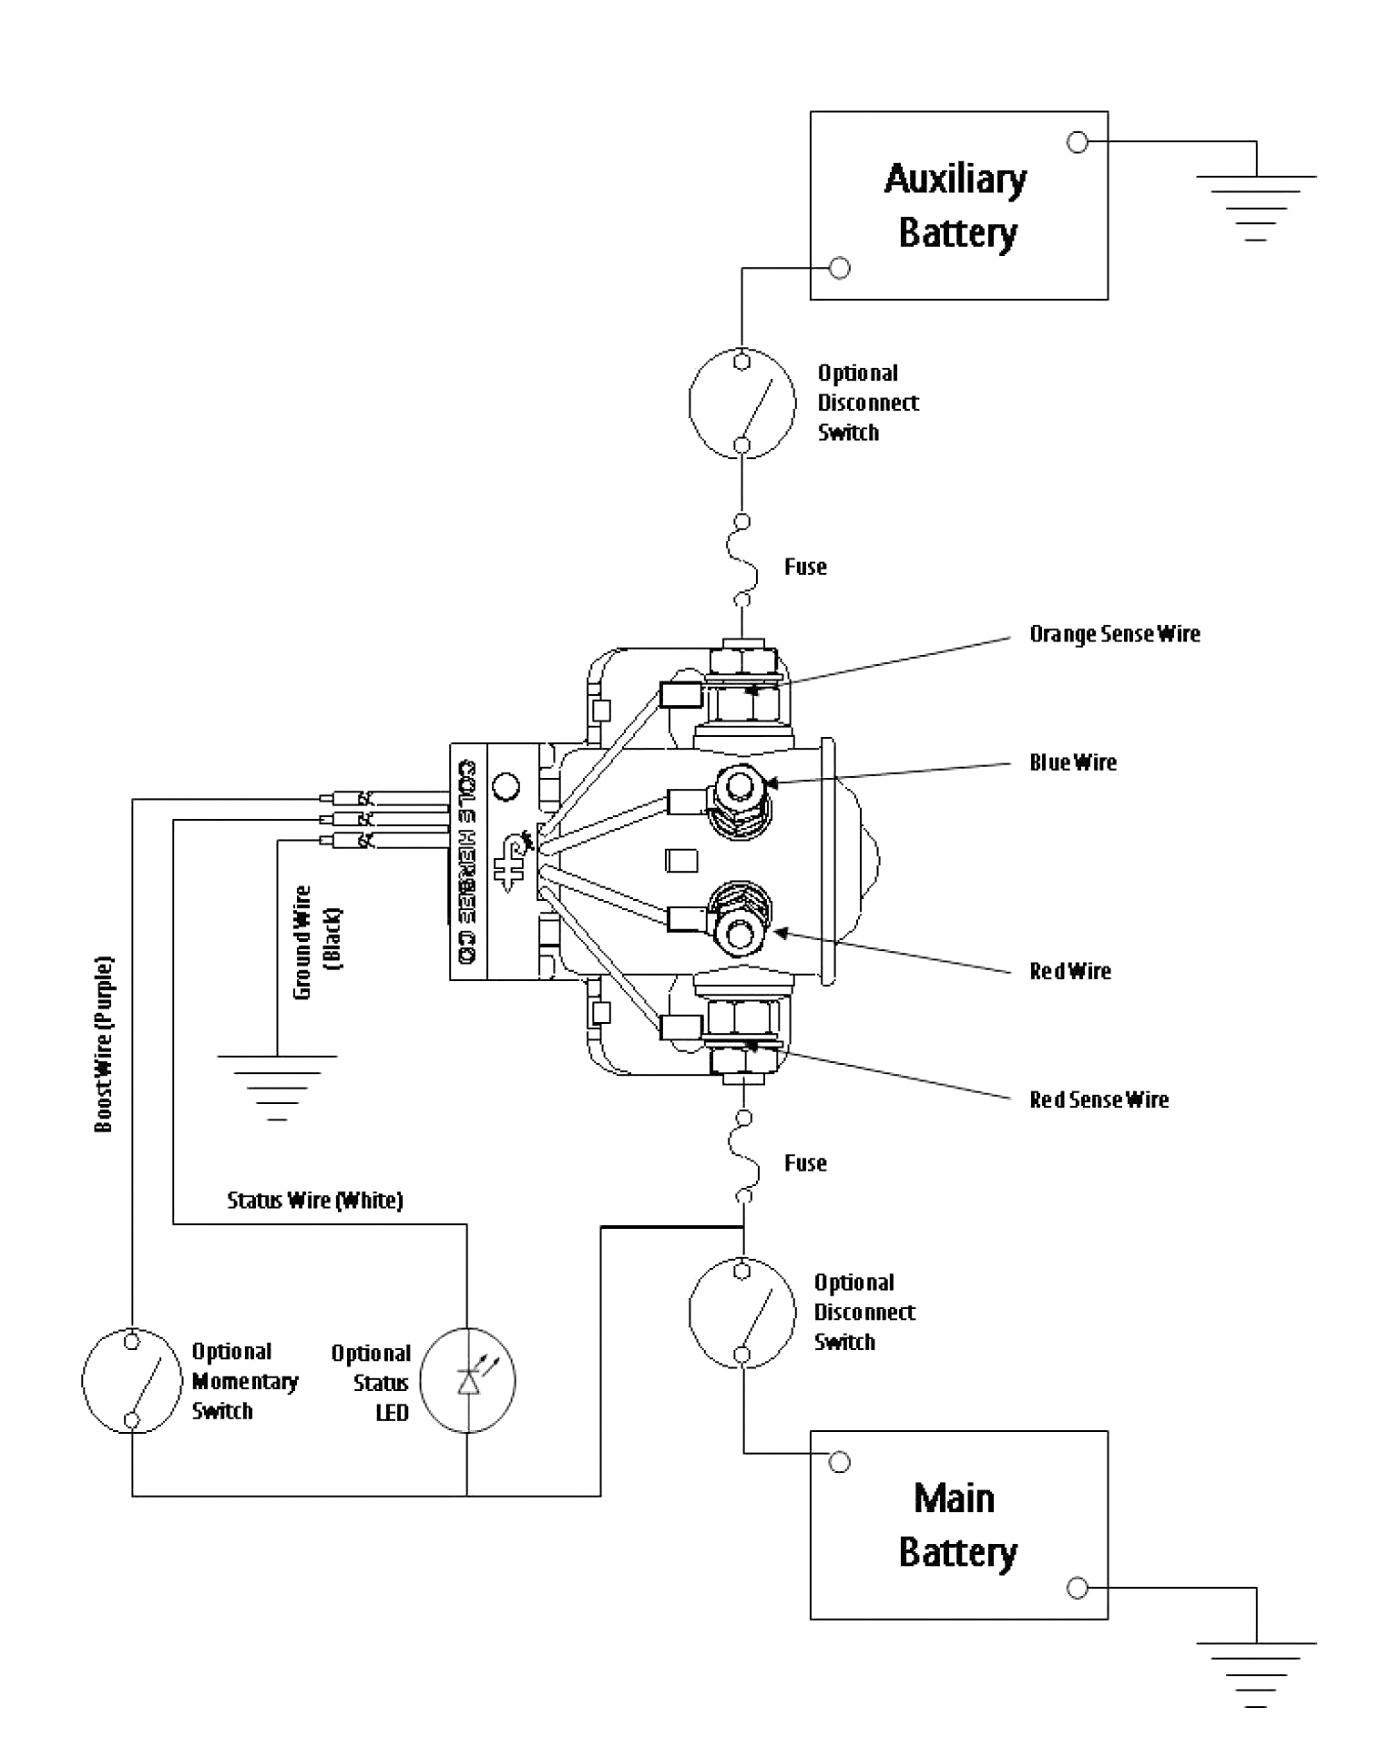 Procinema 600 Wiring Diagram Simplified Shapes Procinema 600 Wiring Diagram List Afi Marine Wiper Motor Wiring